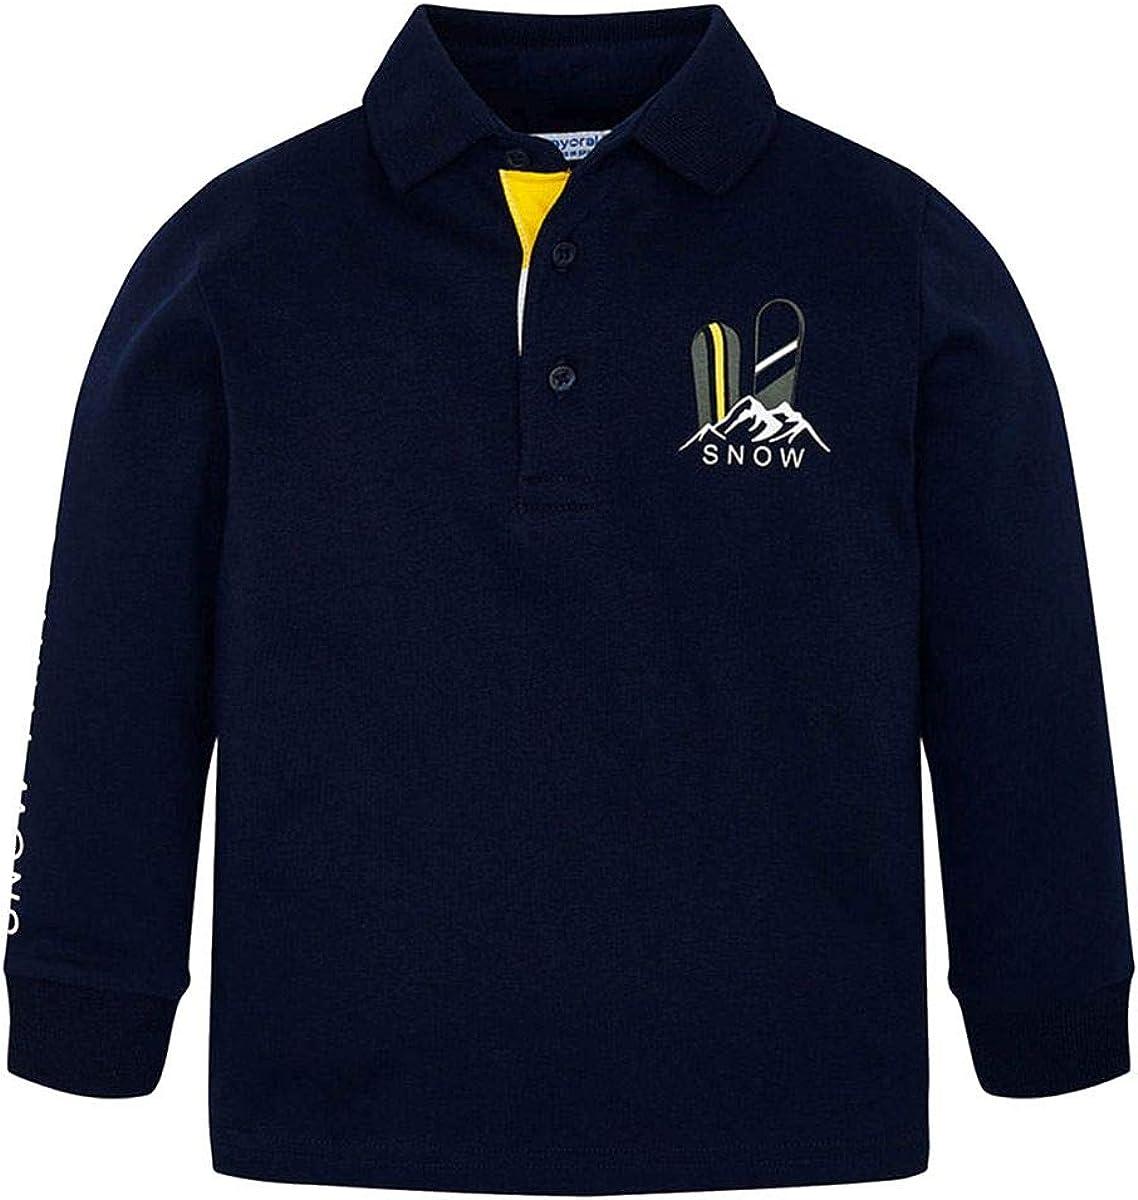 Mayoral Kinder Sportliches Poloshirt